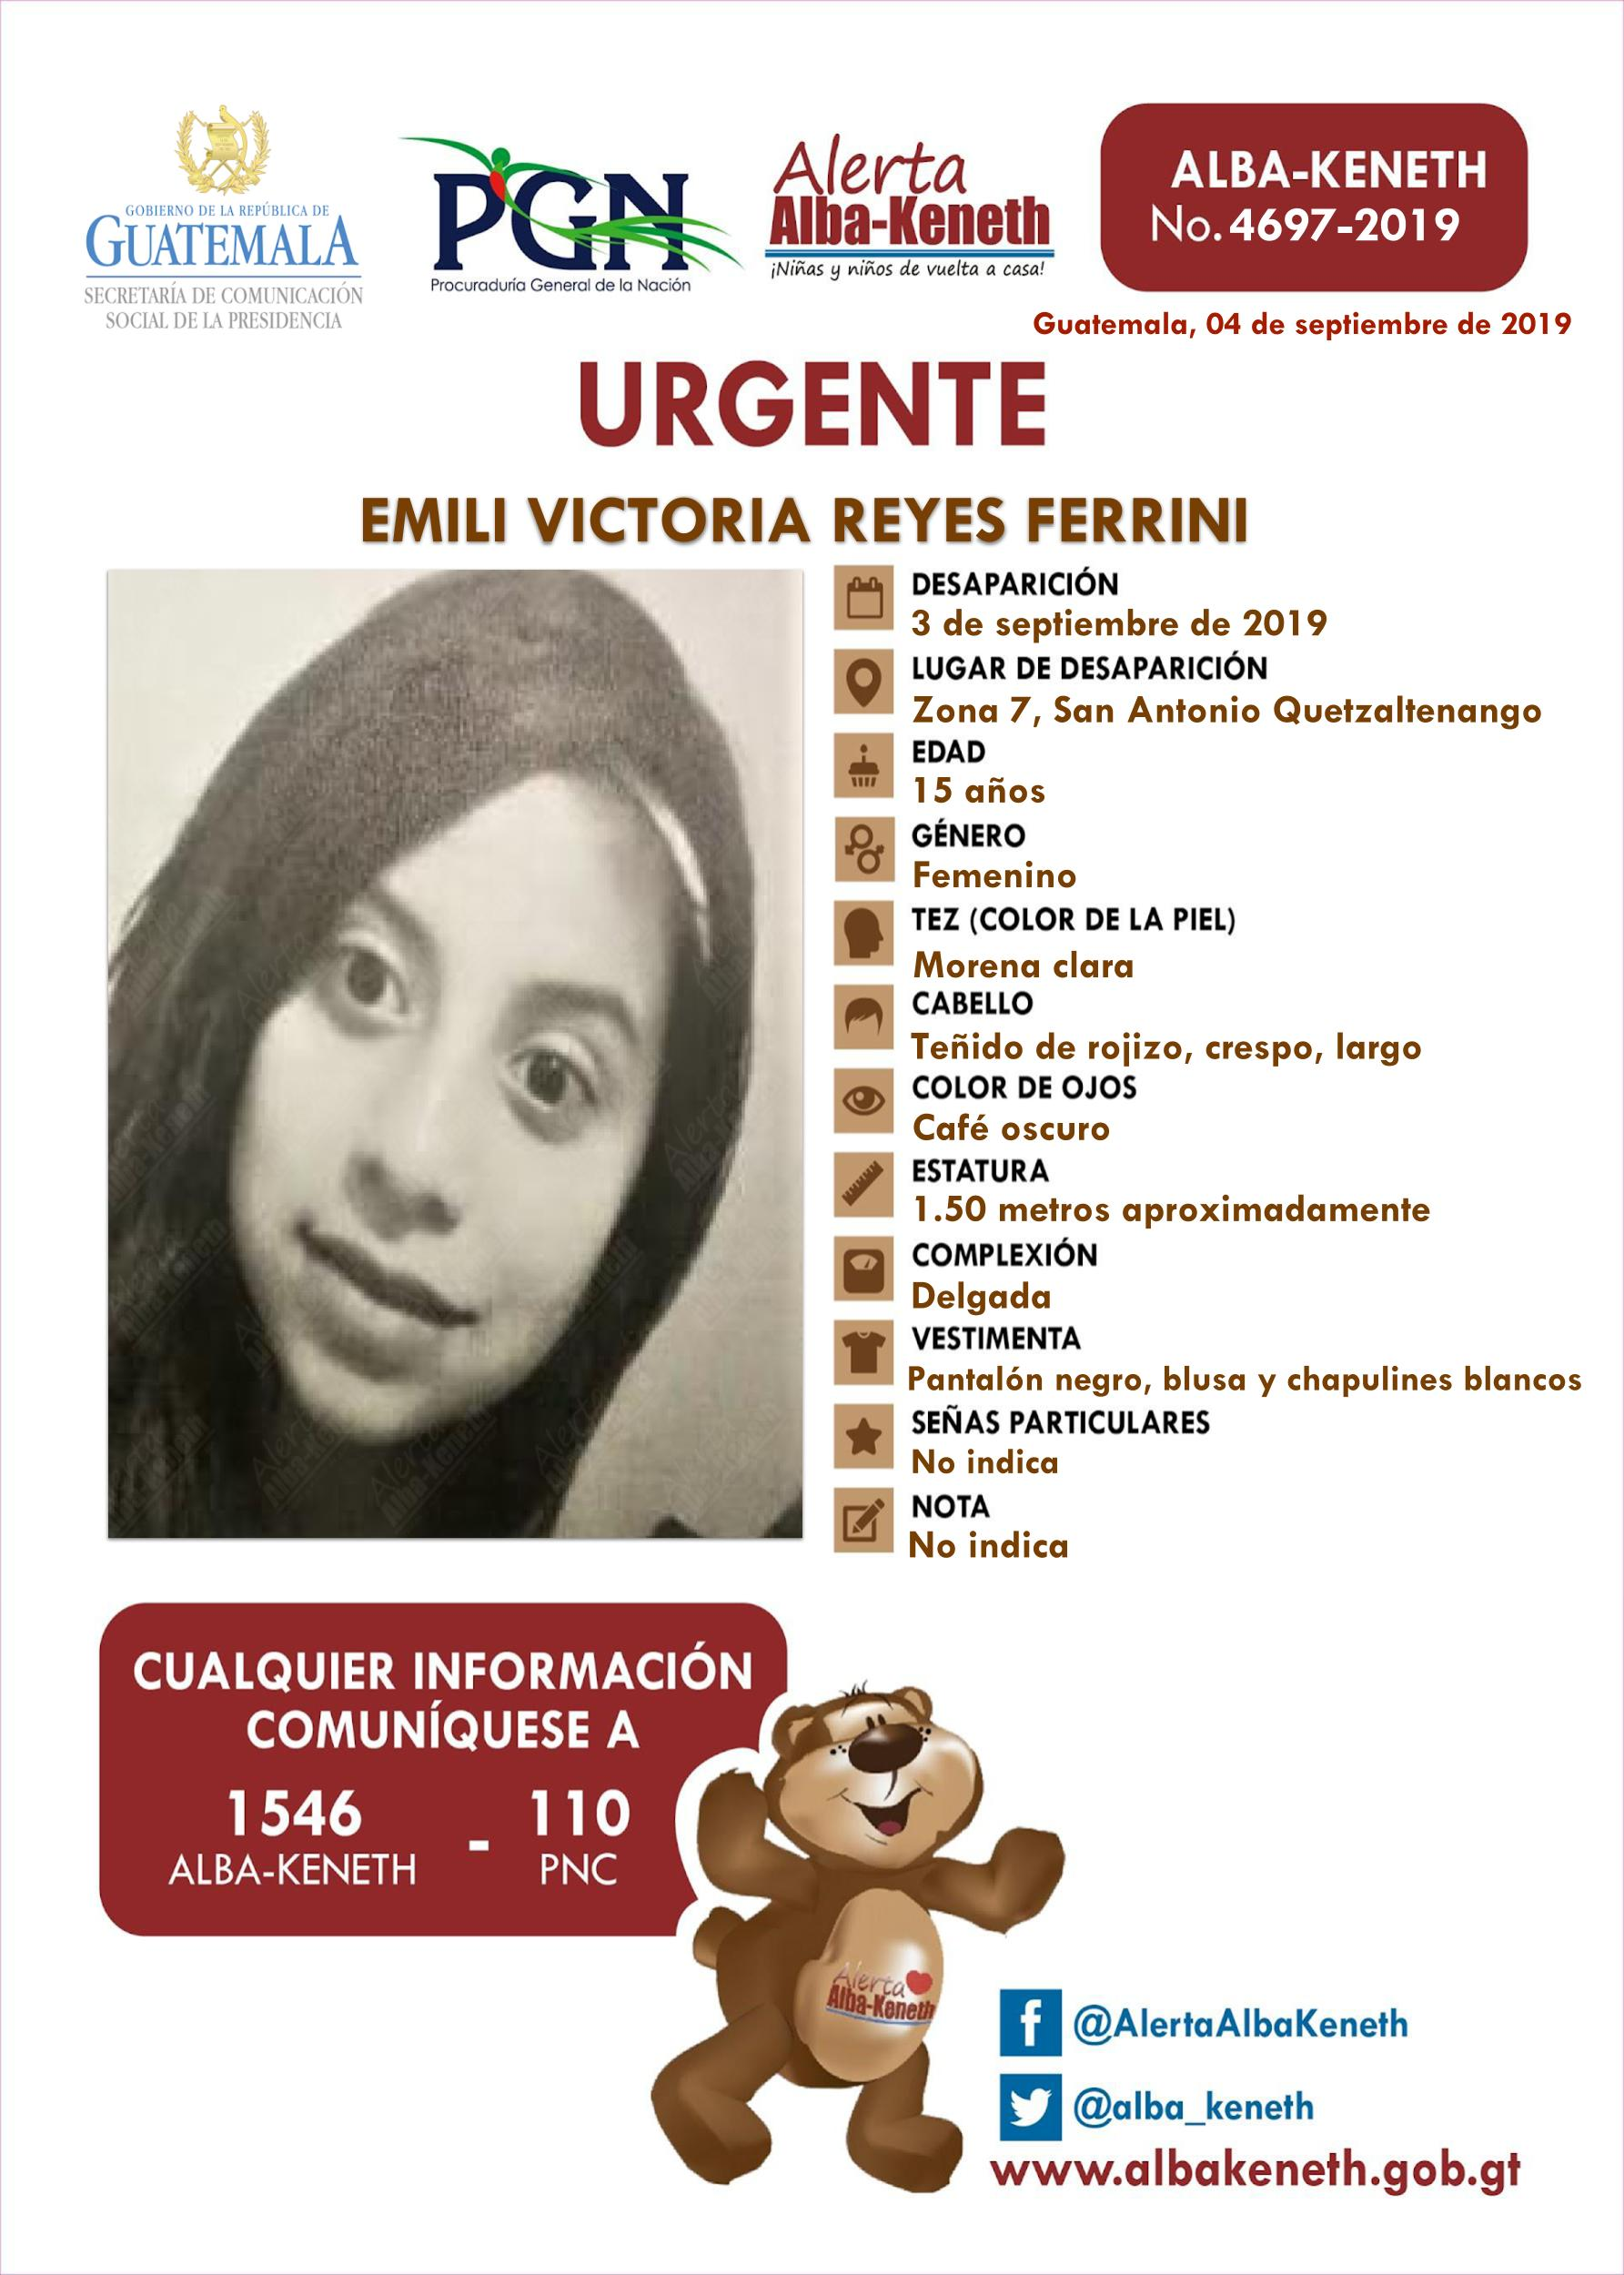 Emili Victoria Reyes Ferrini